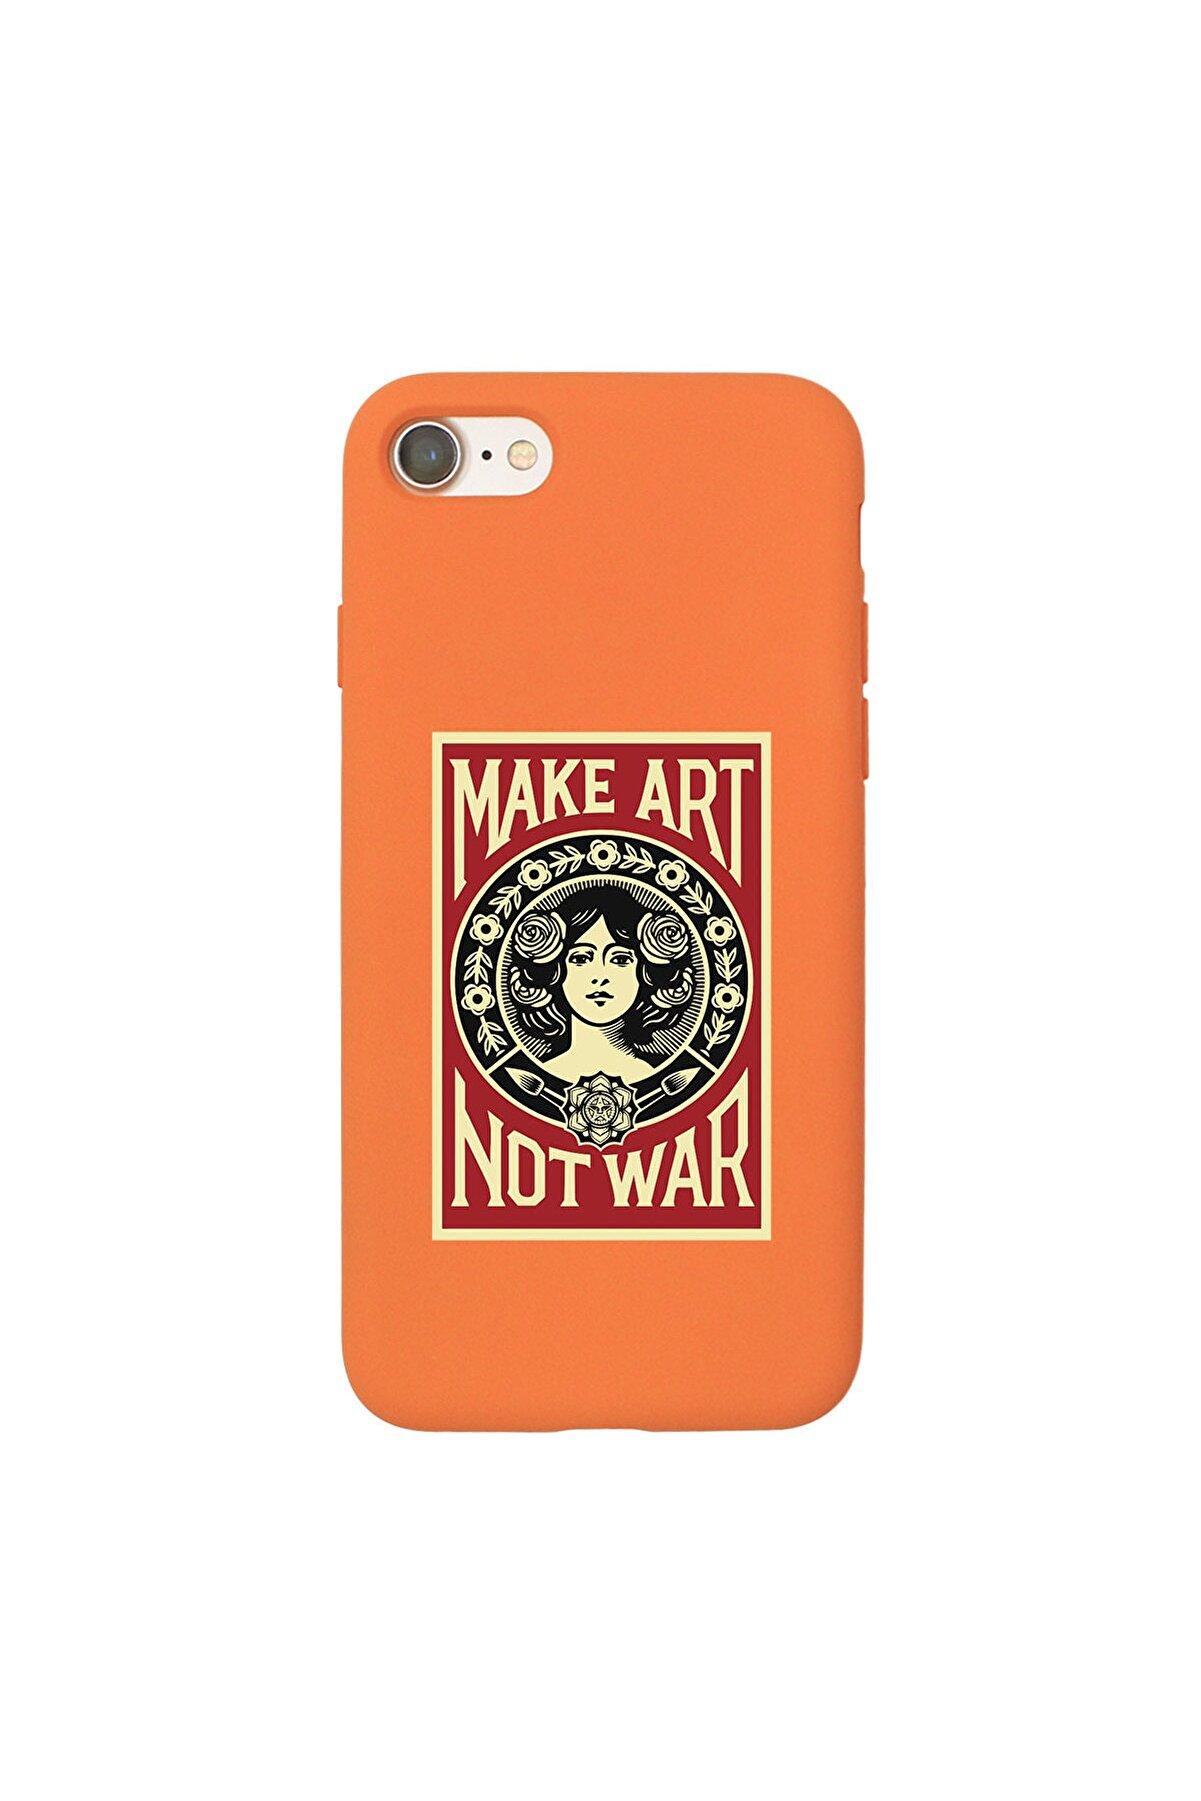 shoptocase Iphone 7 Lansman Make Art Not War Desenli Telefon Kılıfı